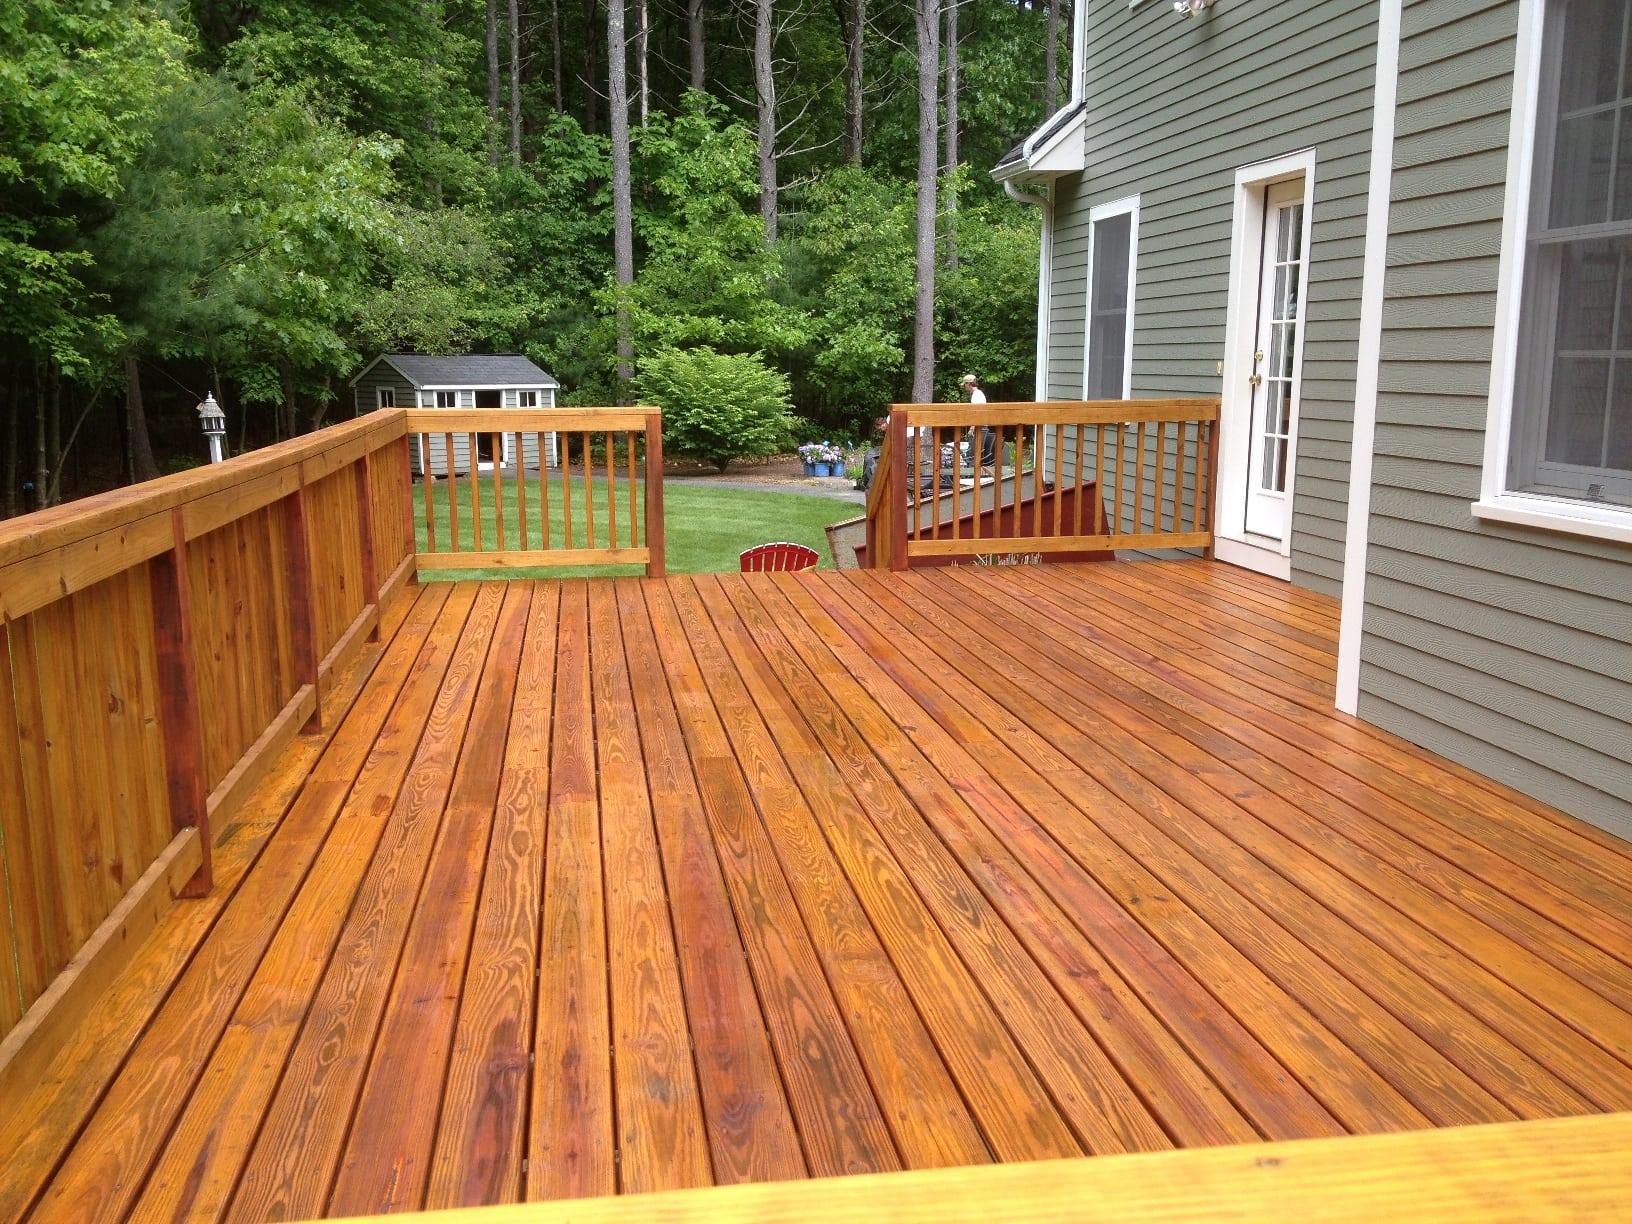 Premium Deck Restoration Staining Refinishing Seacoast Nh in measurements 1632 X 1224